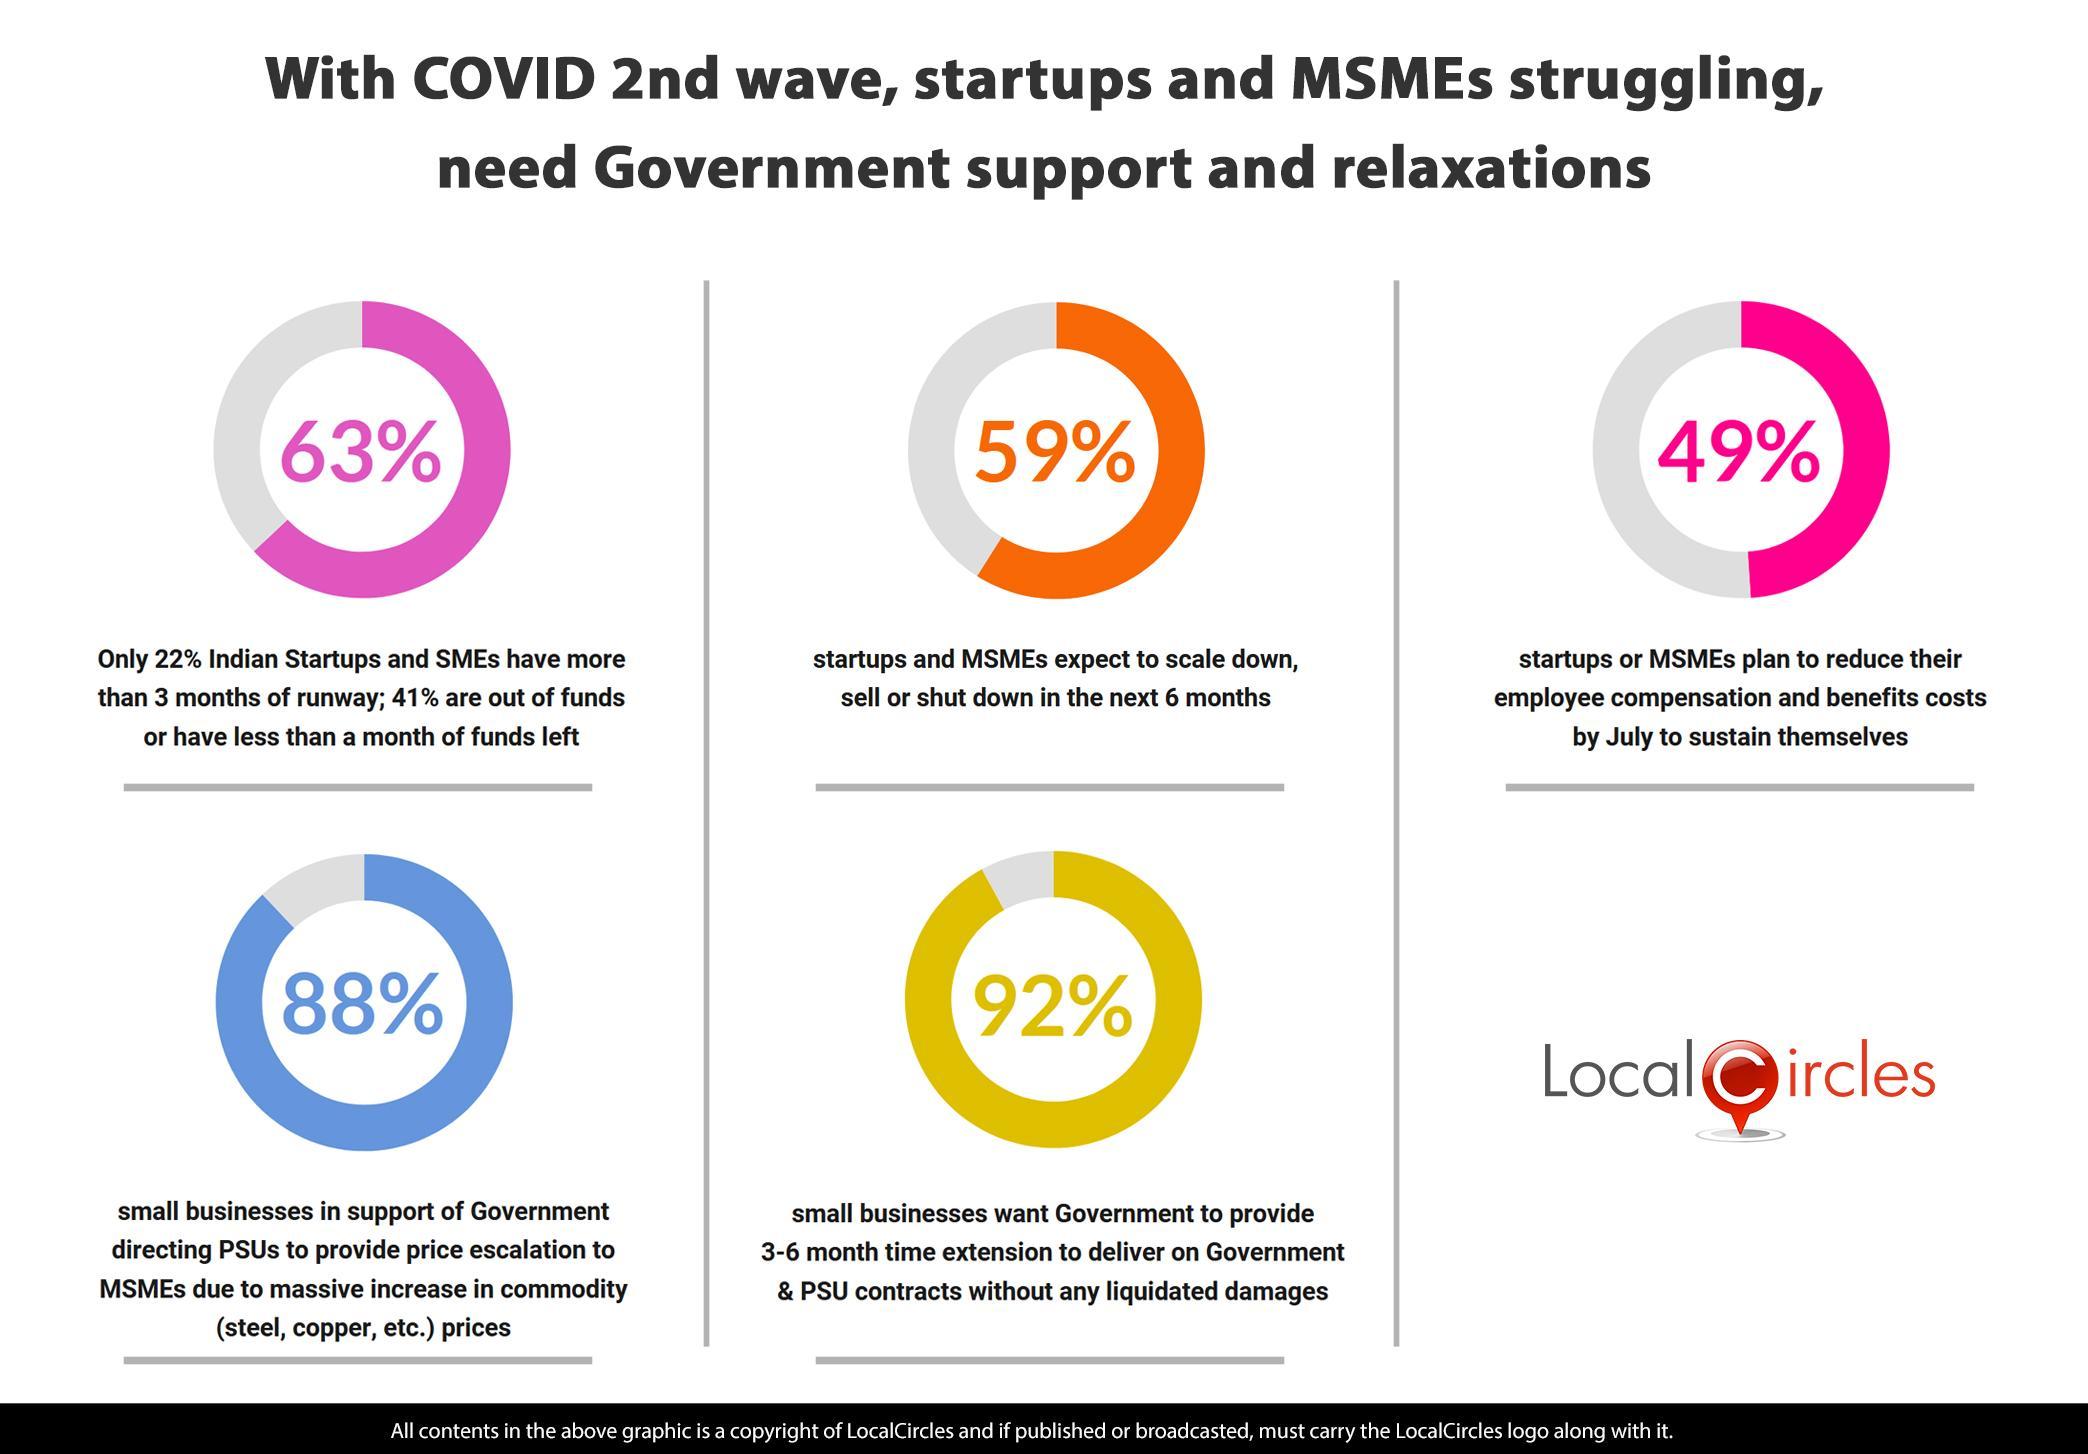 via_LocalCircles_Startup_New_Polls_-_18_May_2021_-_Summary_-_Updated___20210529051757___.jpg